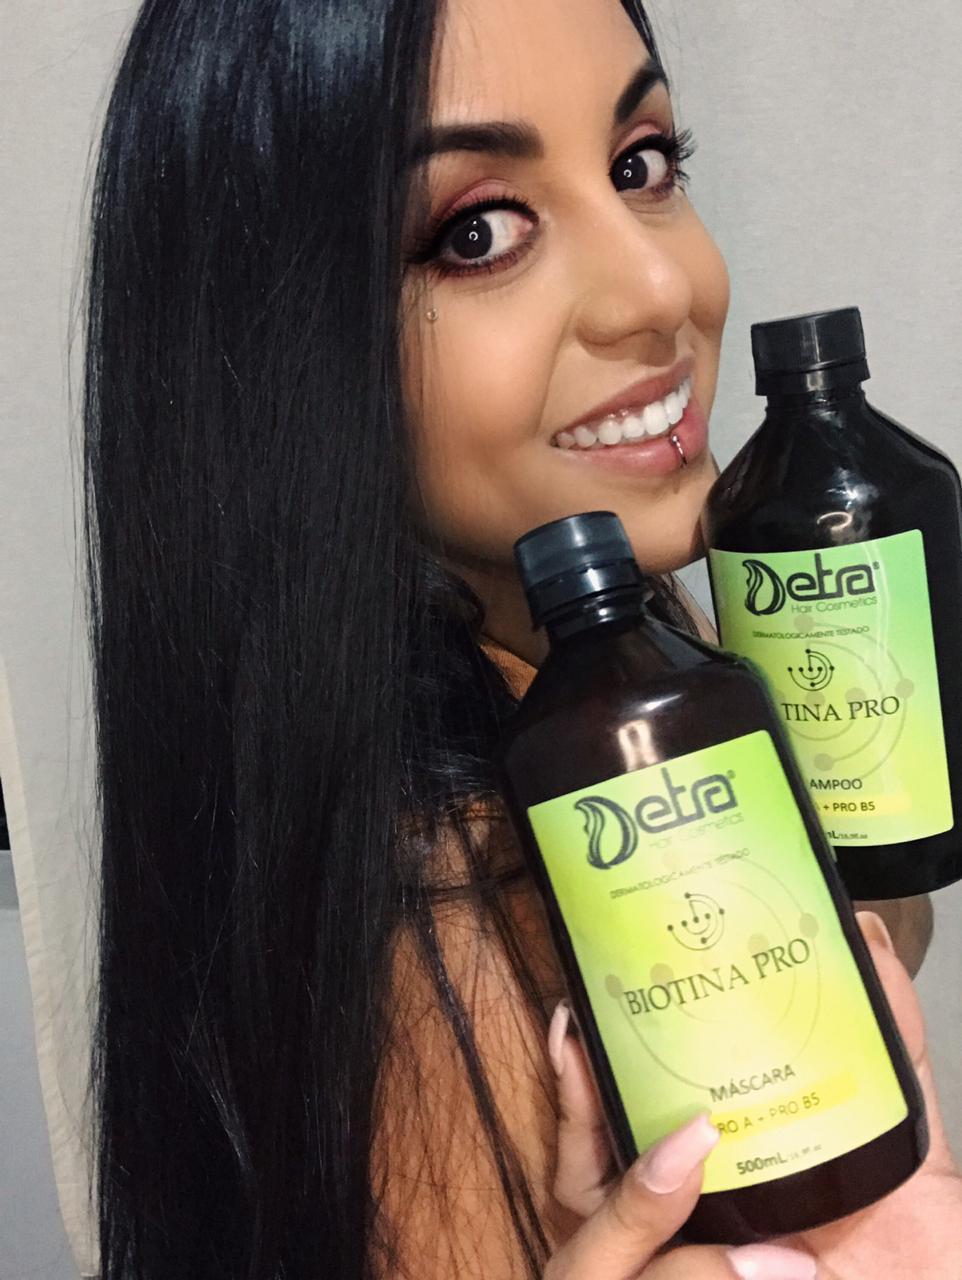 Detra Hair Cosmeticos  Mascara Biotina Pro 500ml